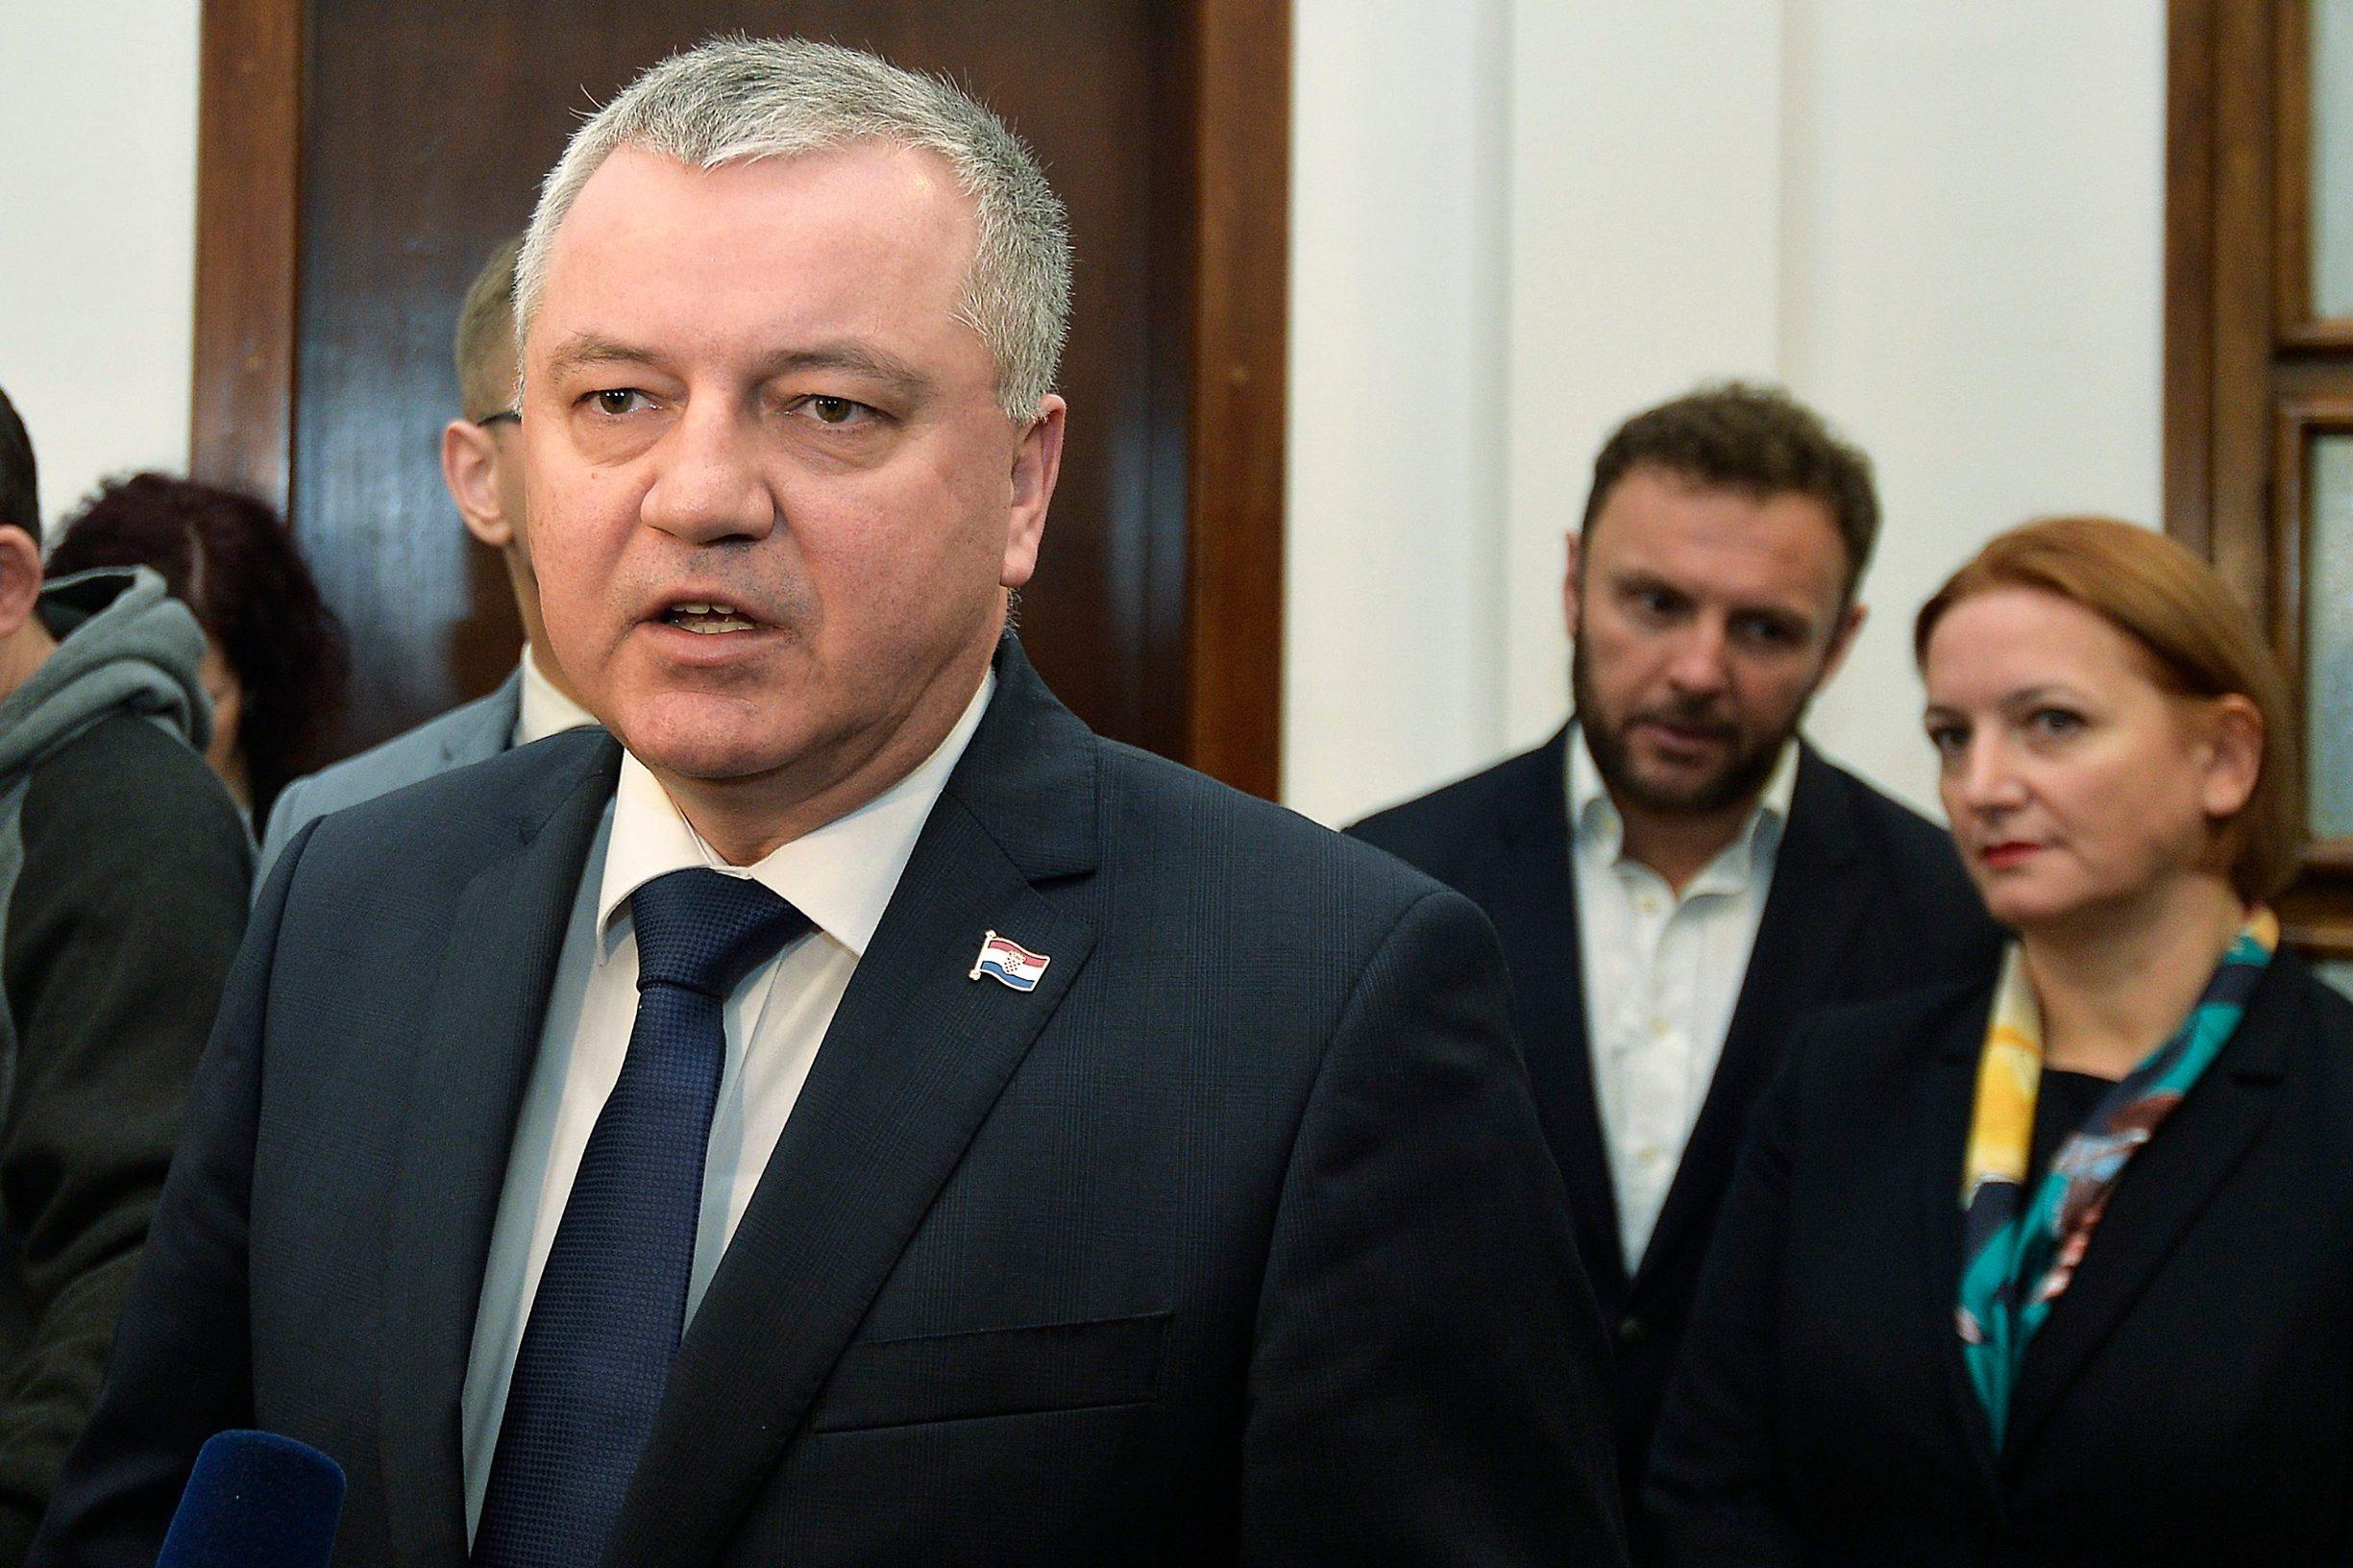 Hrvatsko-albanski gospodarski forum, Darko Horvat, ministar gospodarstva, poduzetništva i obrta